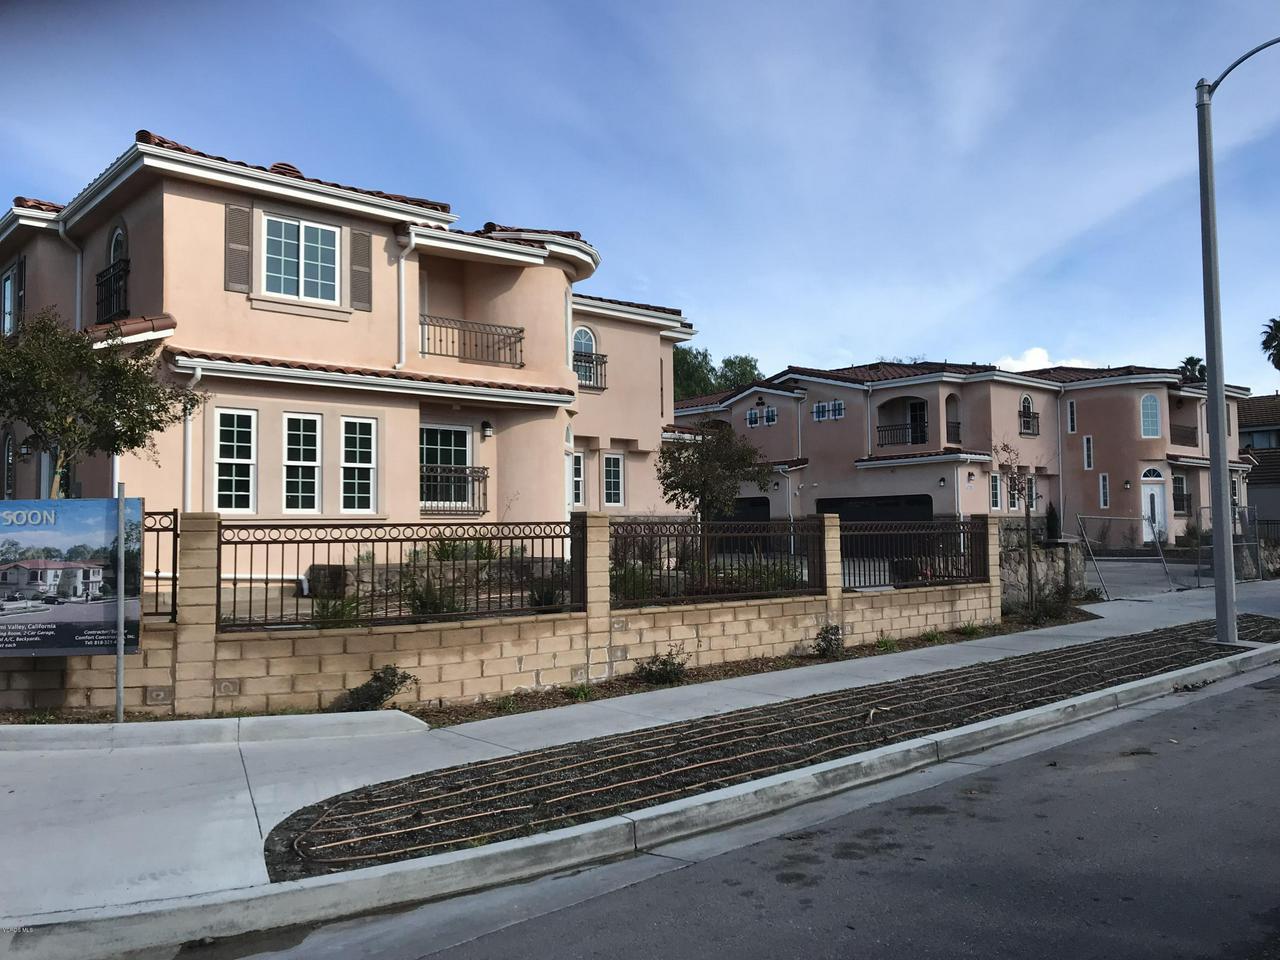 1701 PATRICIA, Simi Valley, CA 93065 - Front